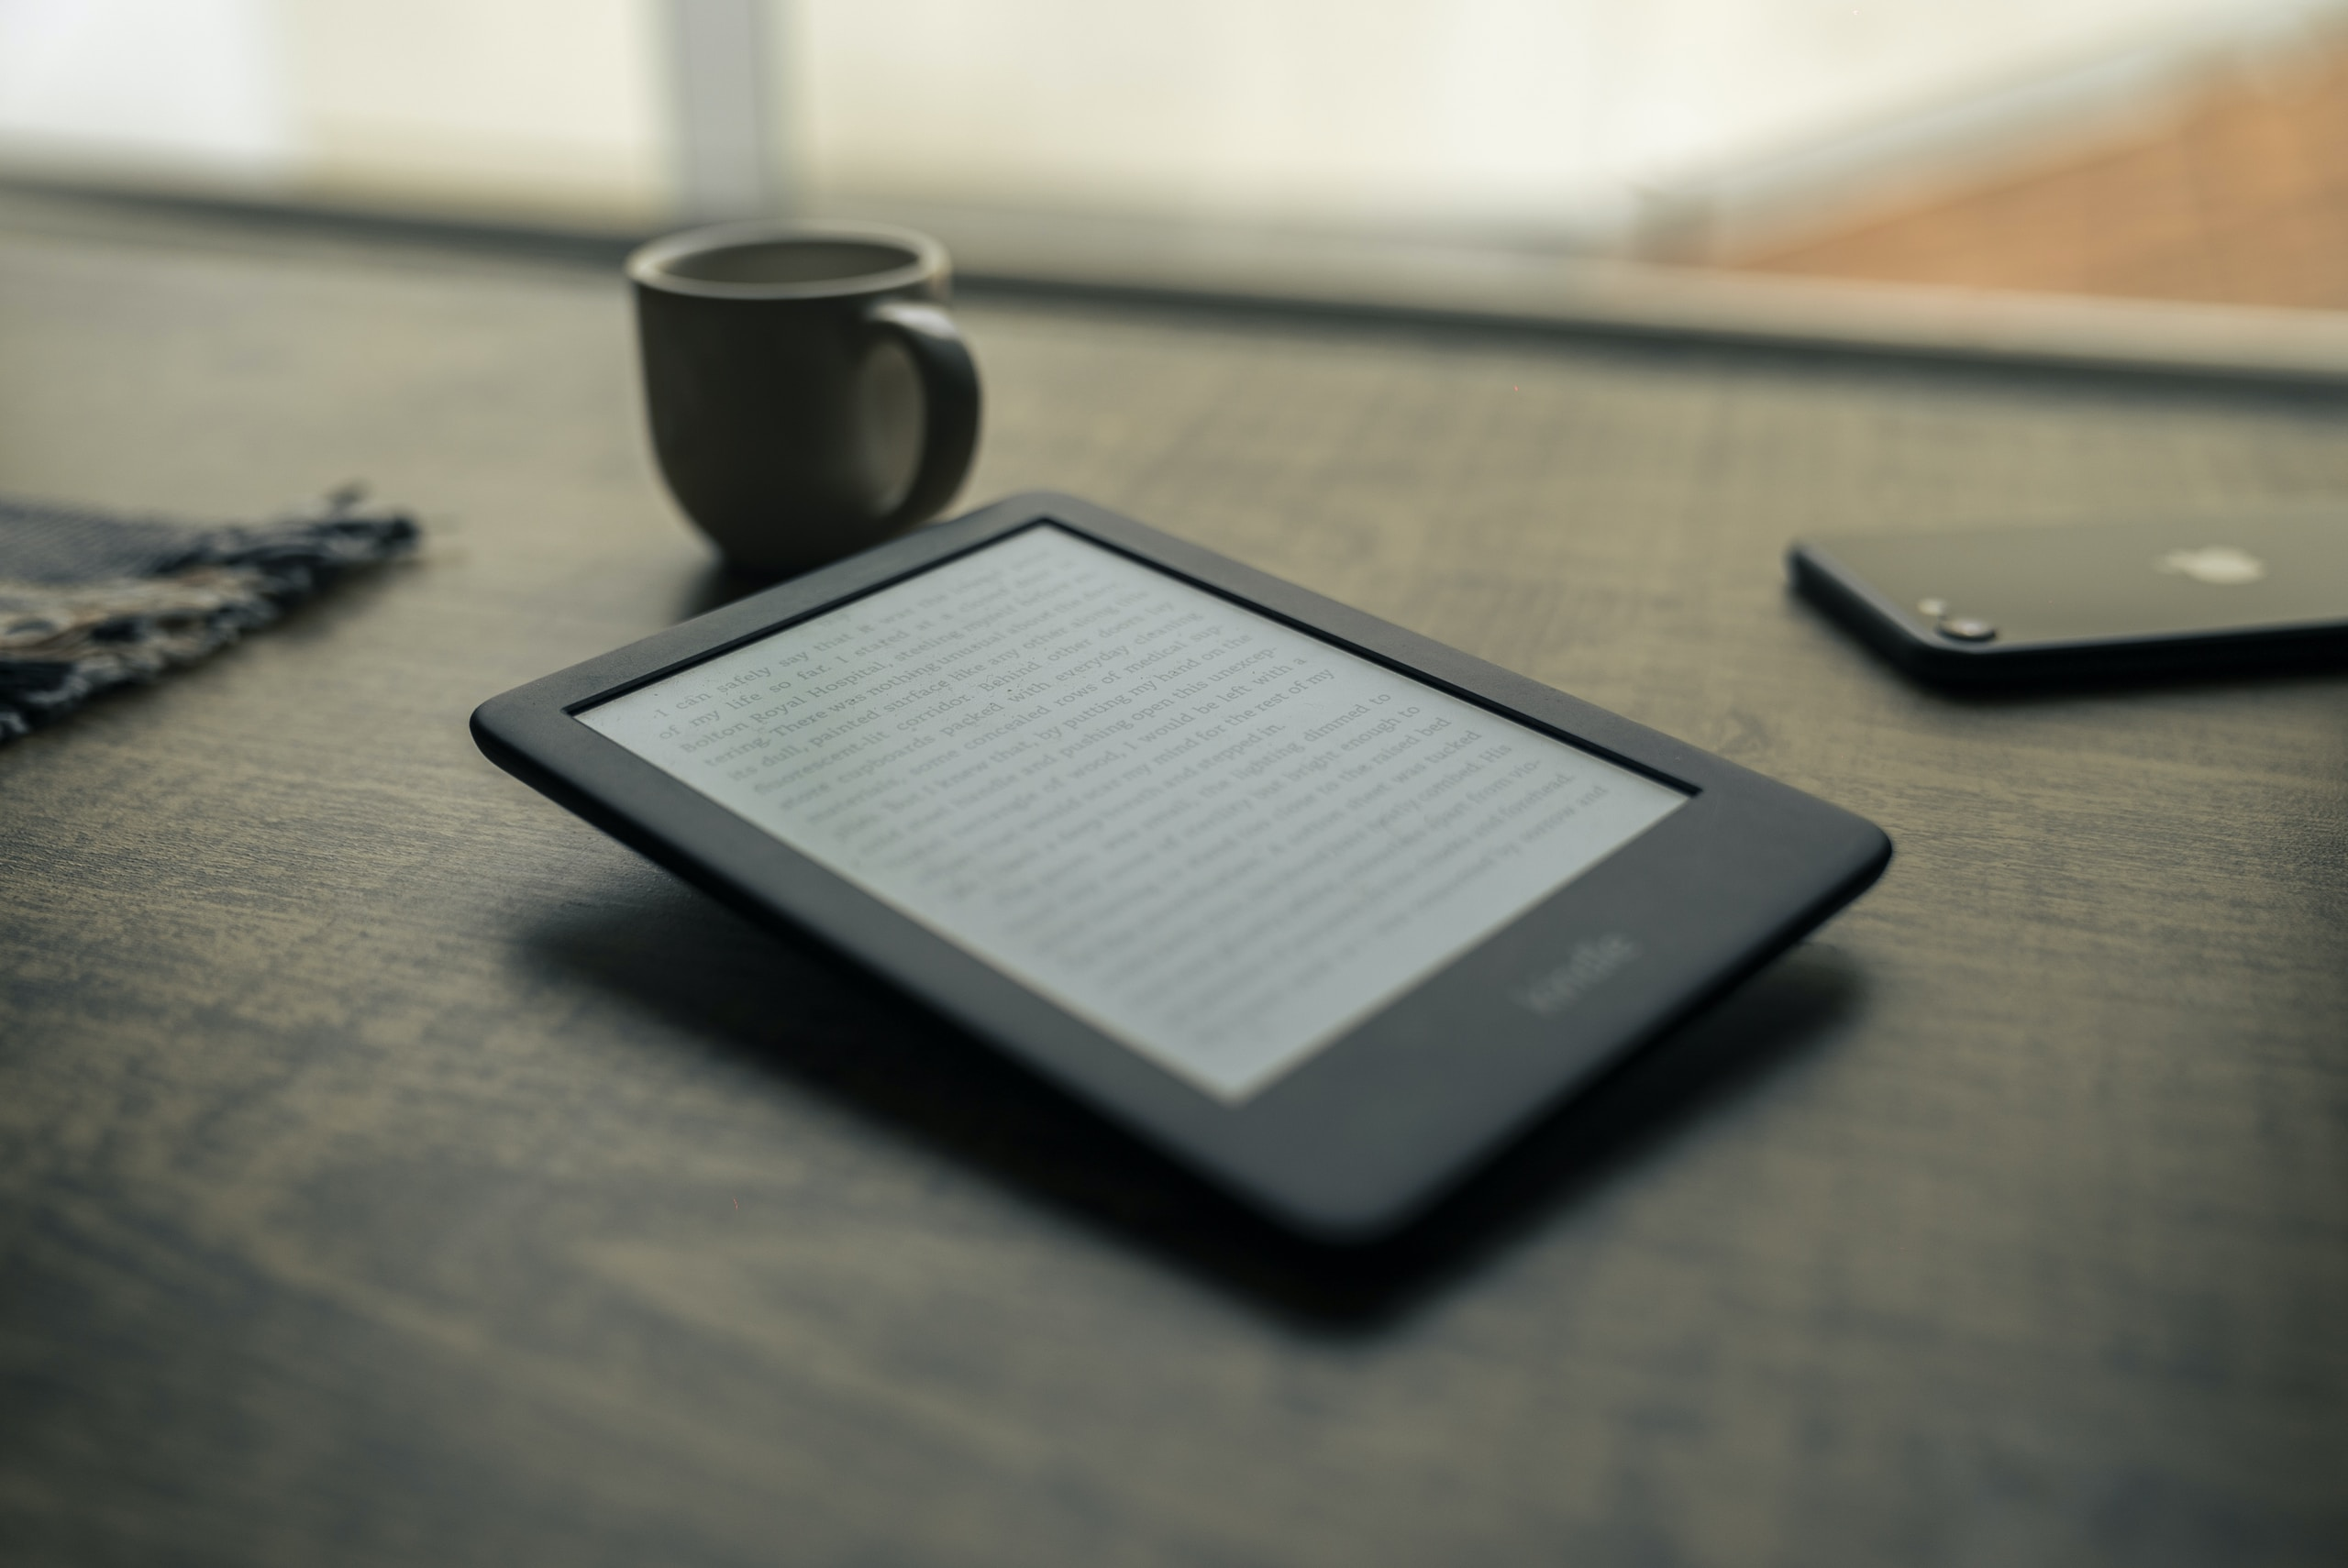 black android smartphone beside black ceramic mug on brown wooden table